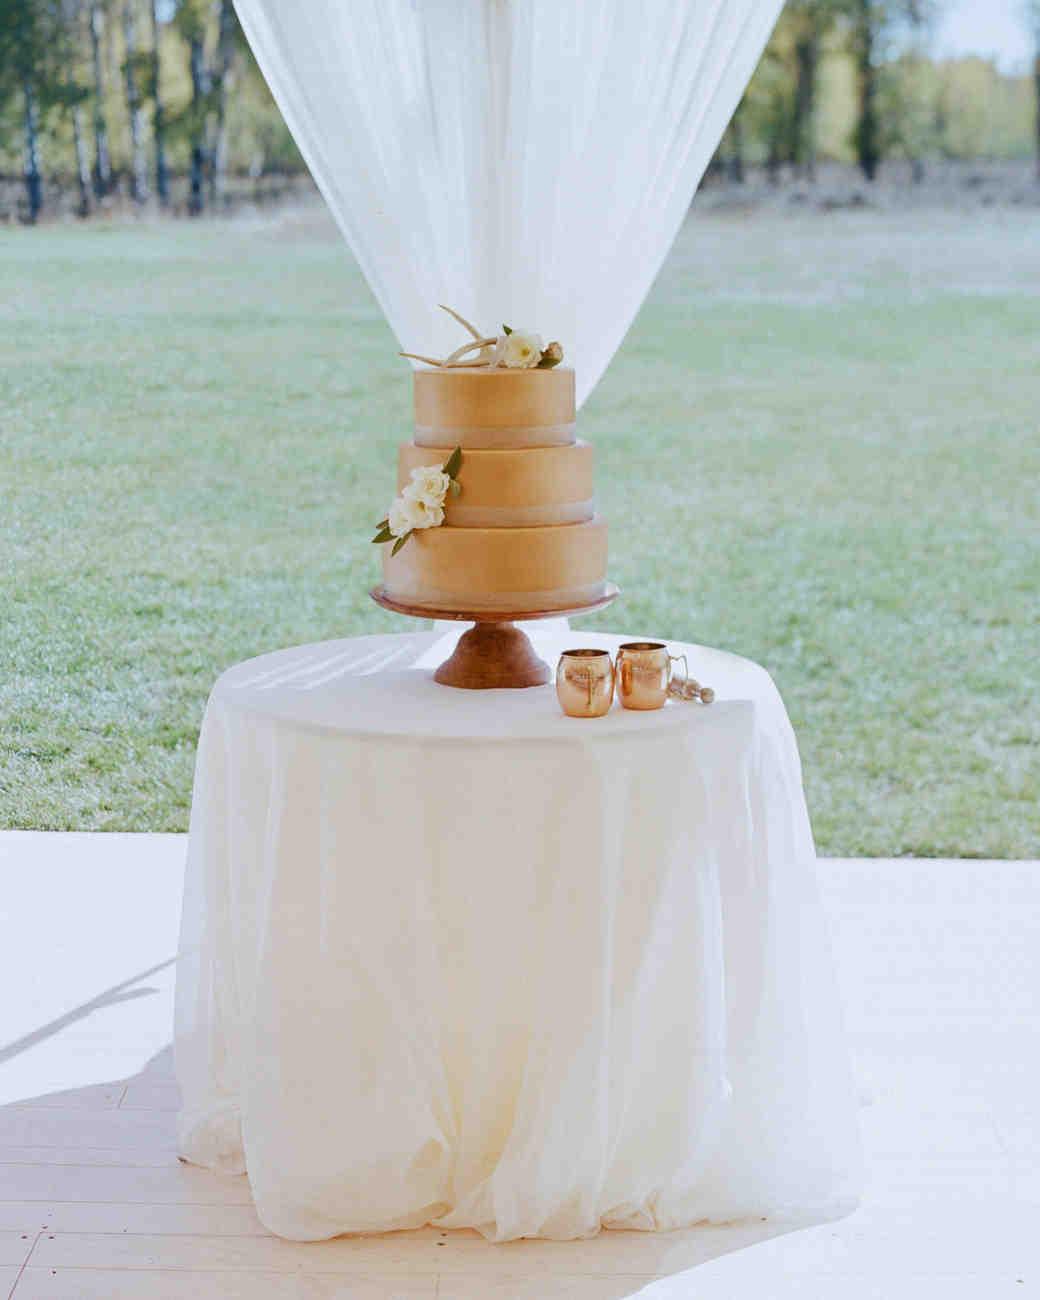 ali-andrew-wedding-wyoming-075-s111942.jpg